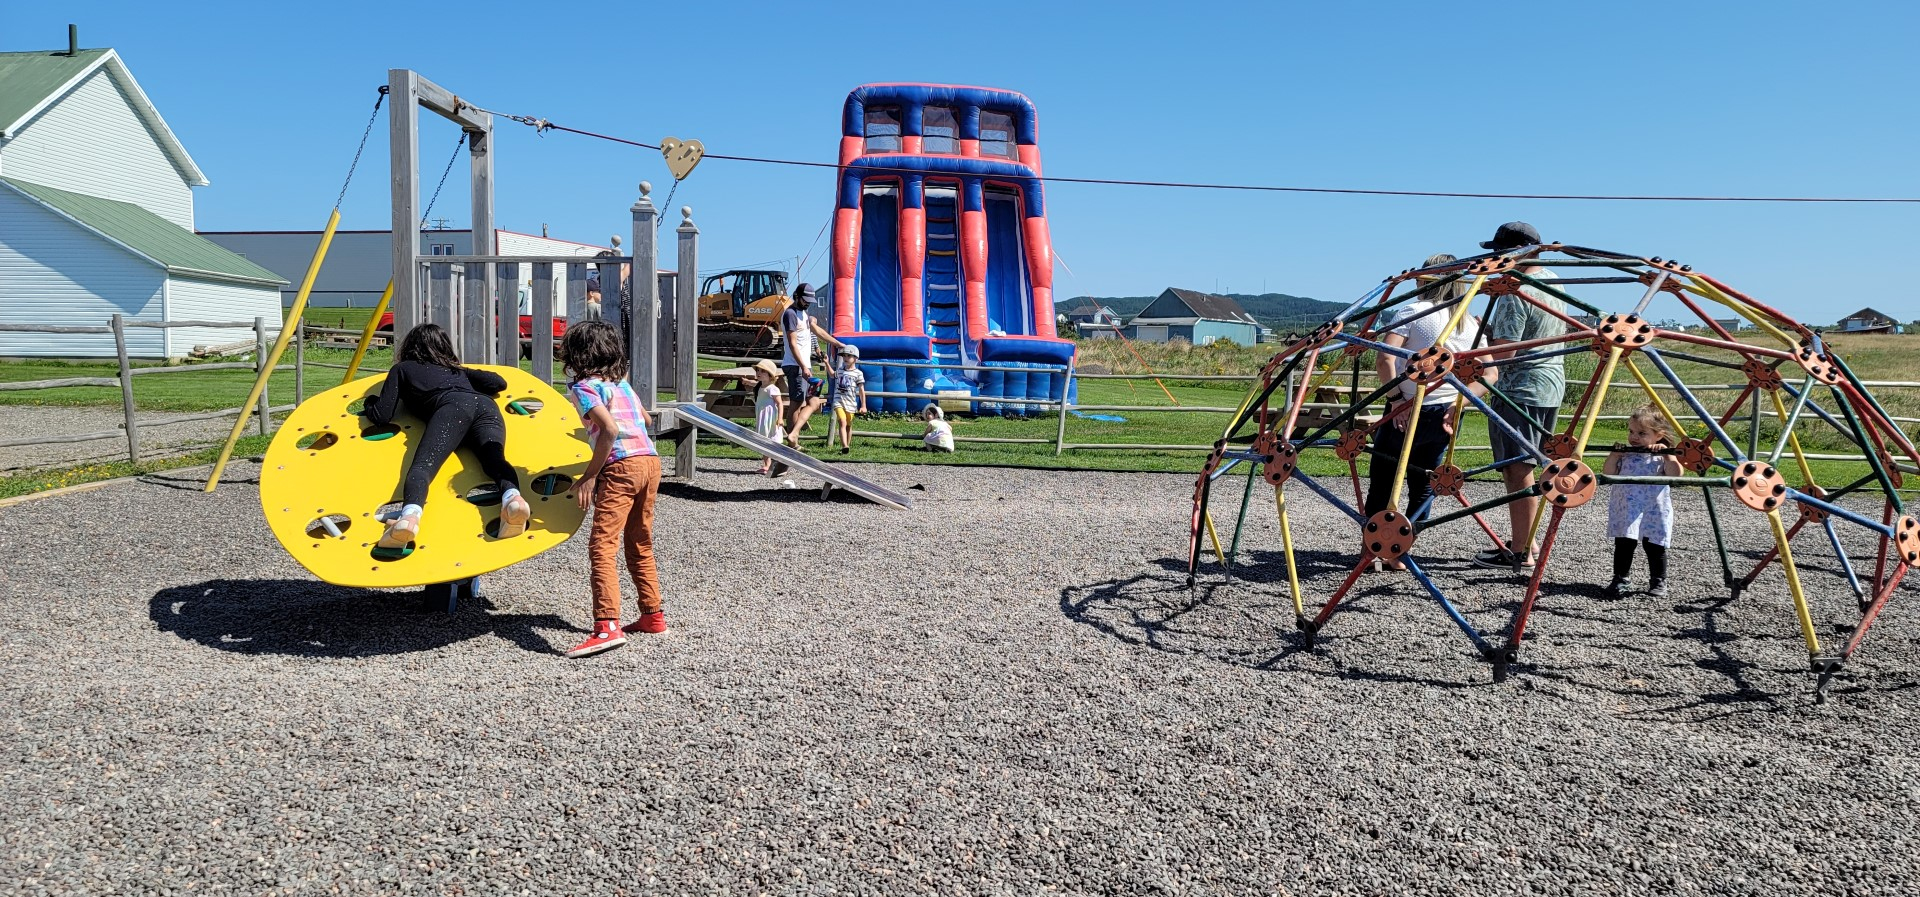 children on Magdalen Islands having fun